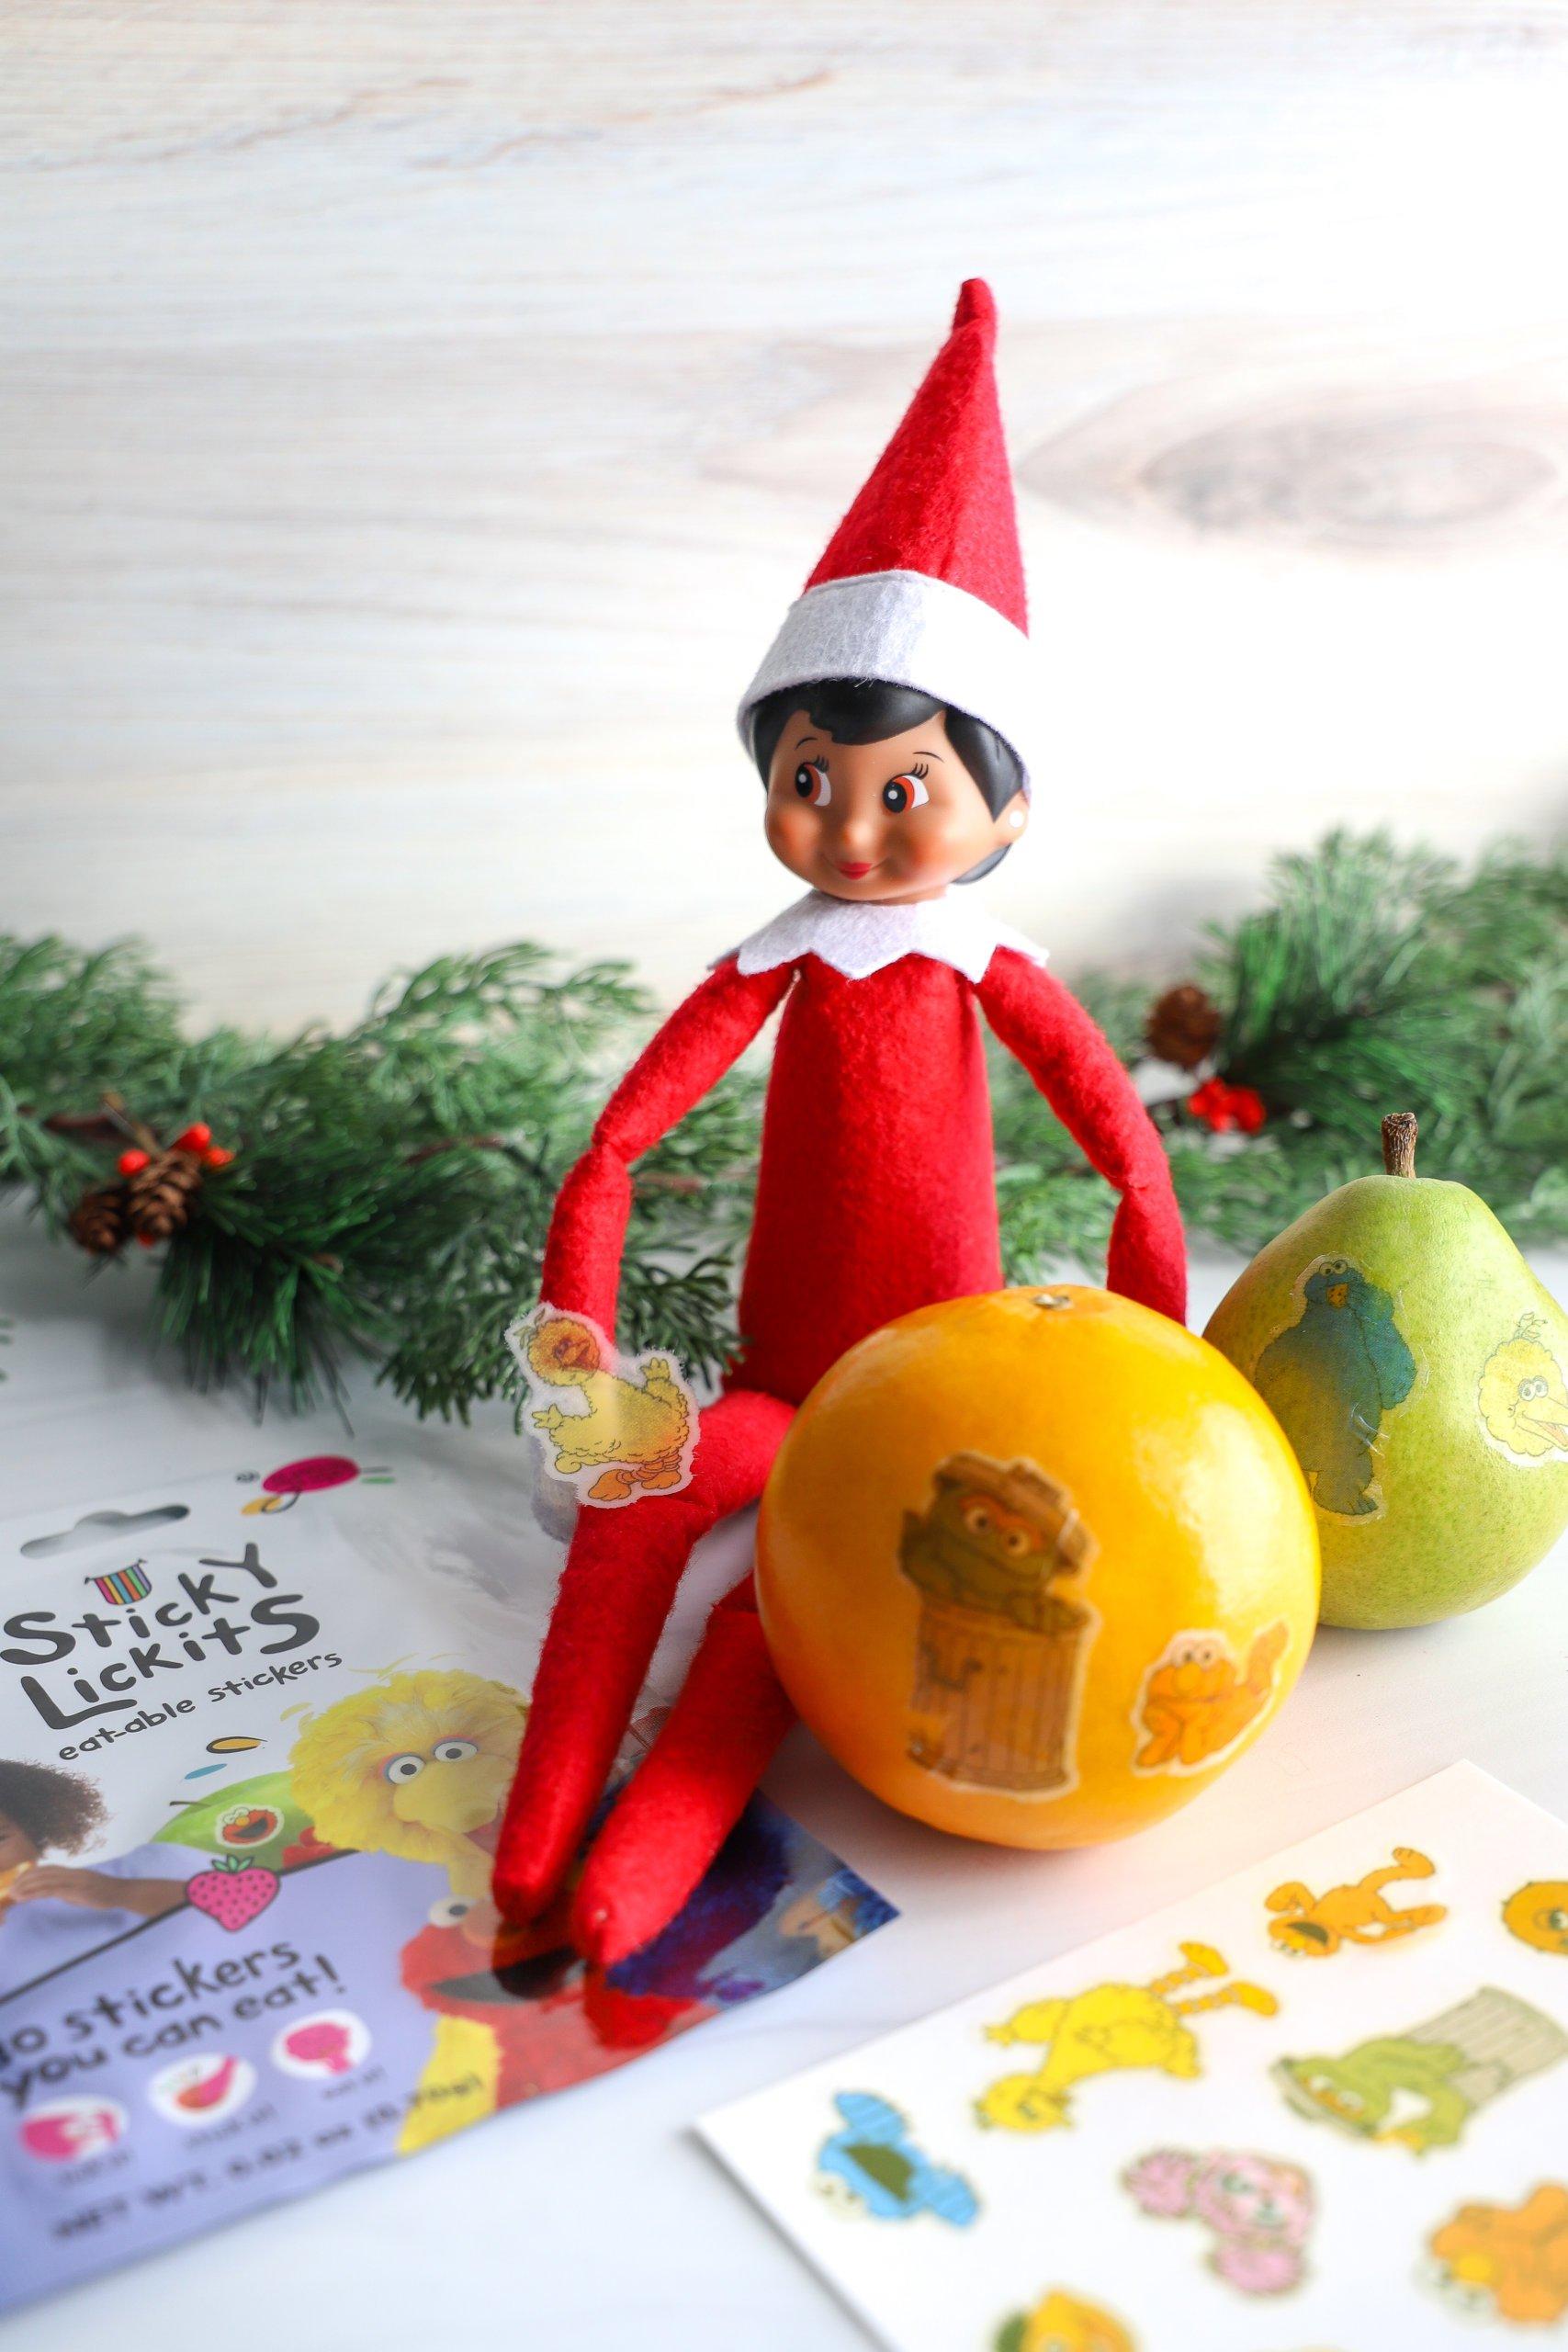 Easy Elf on the Shelf Ideas: Stickers of Fruit